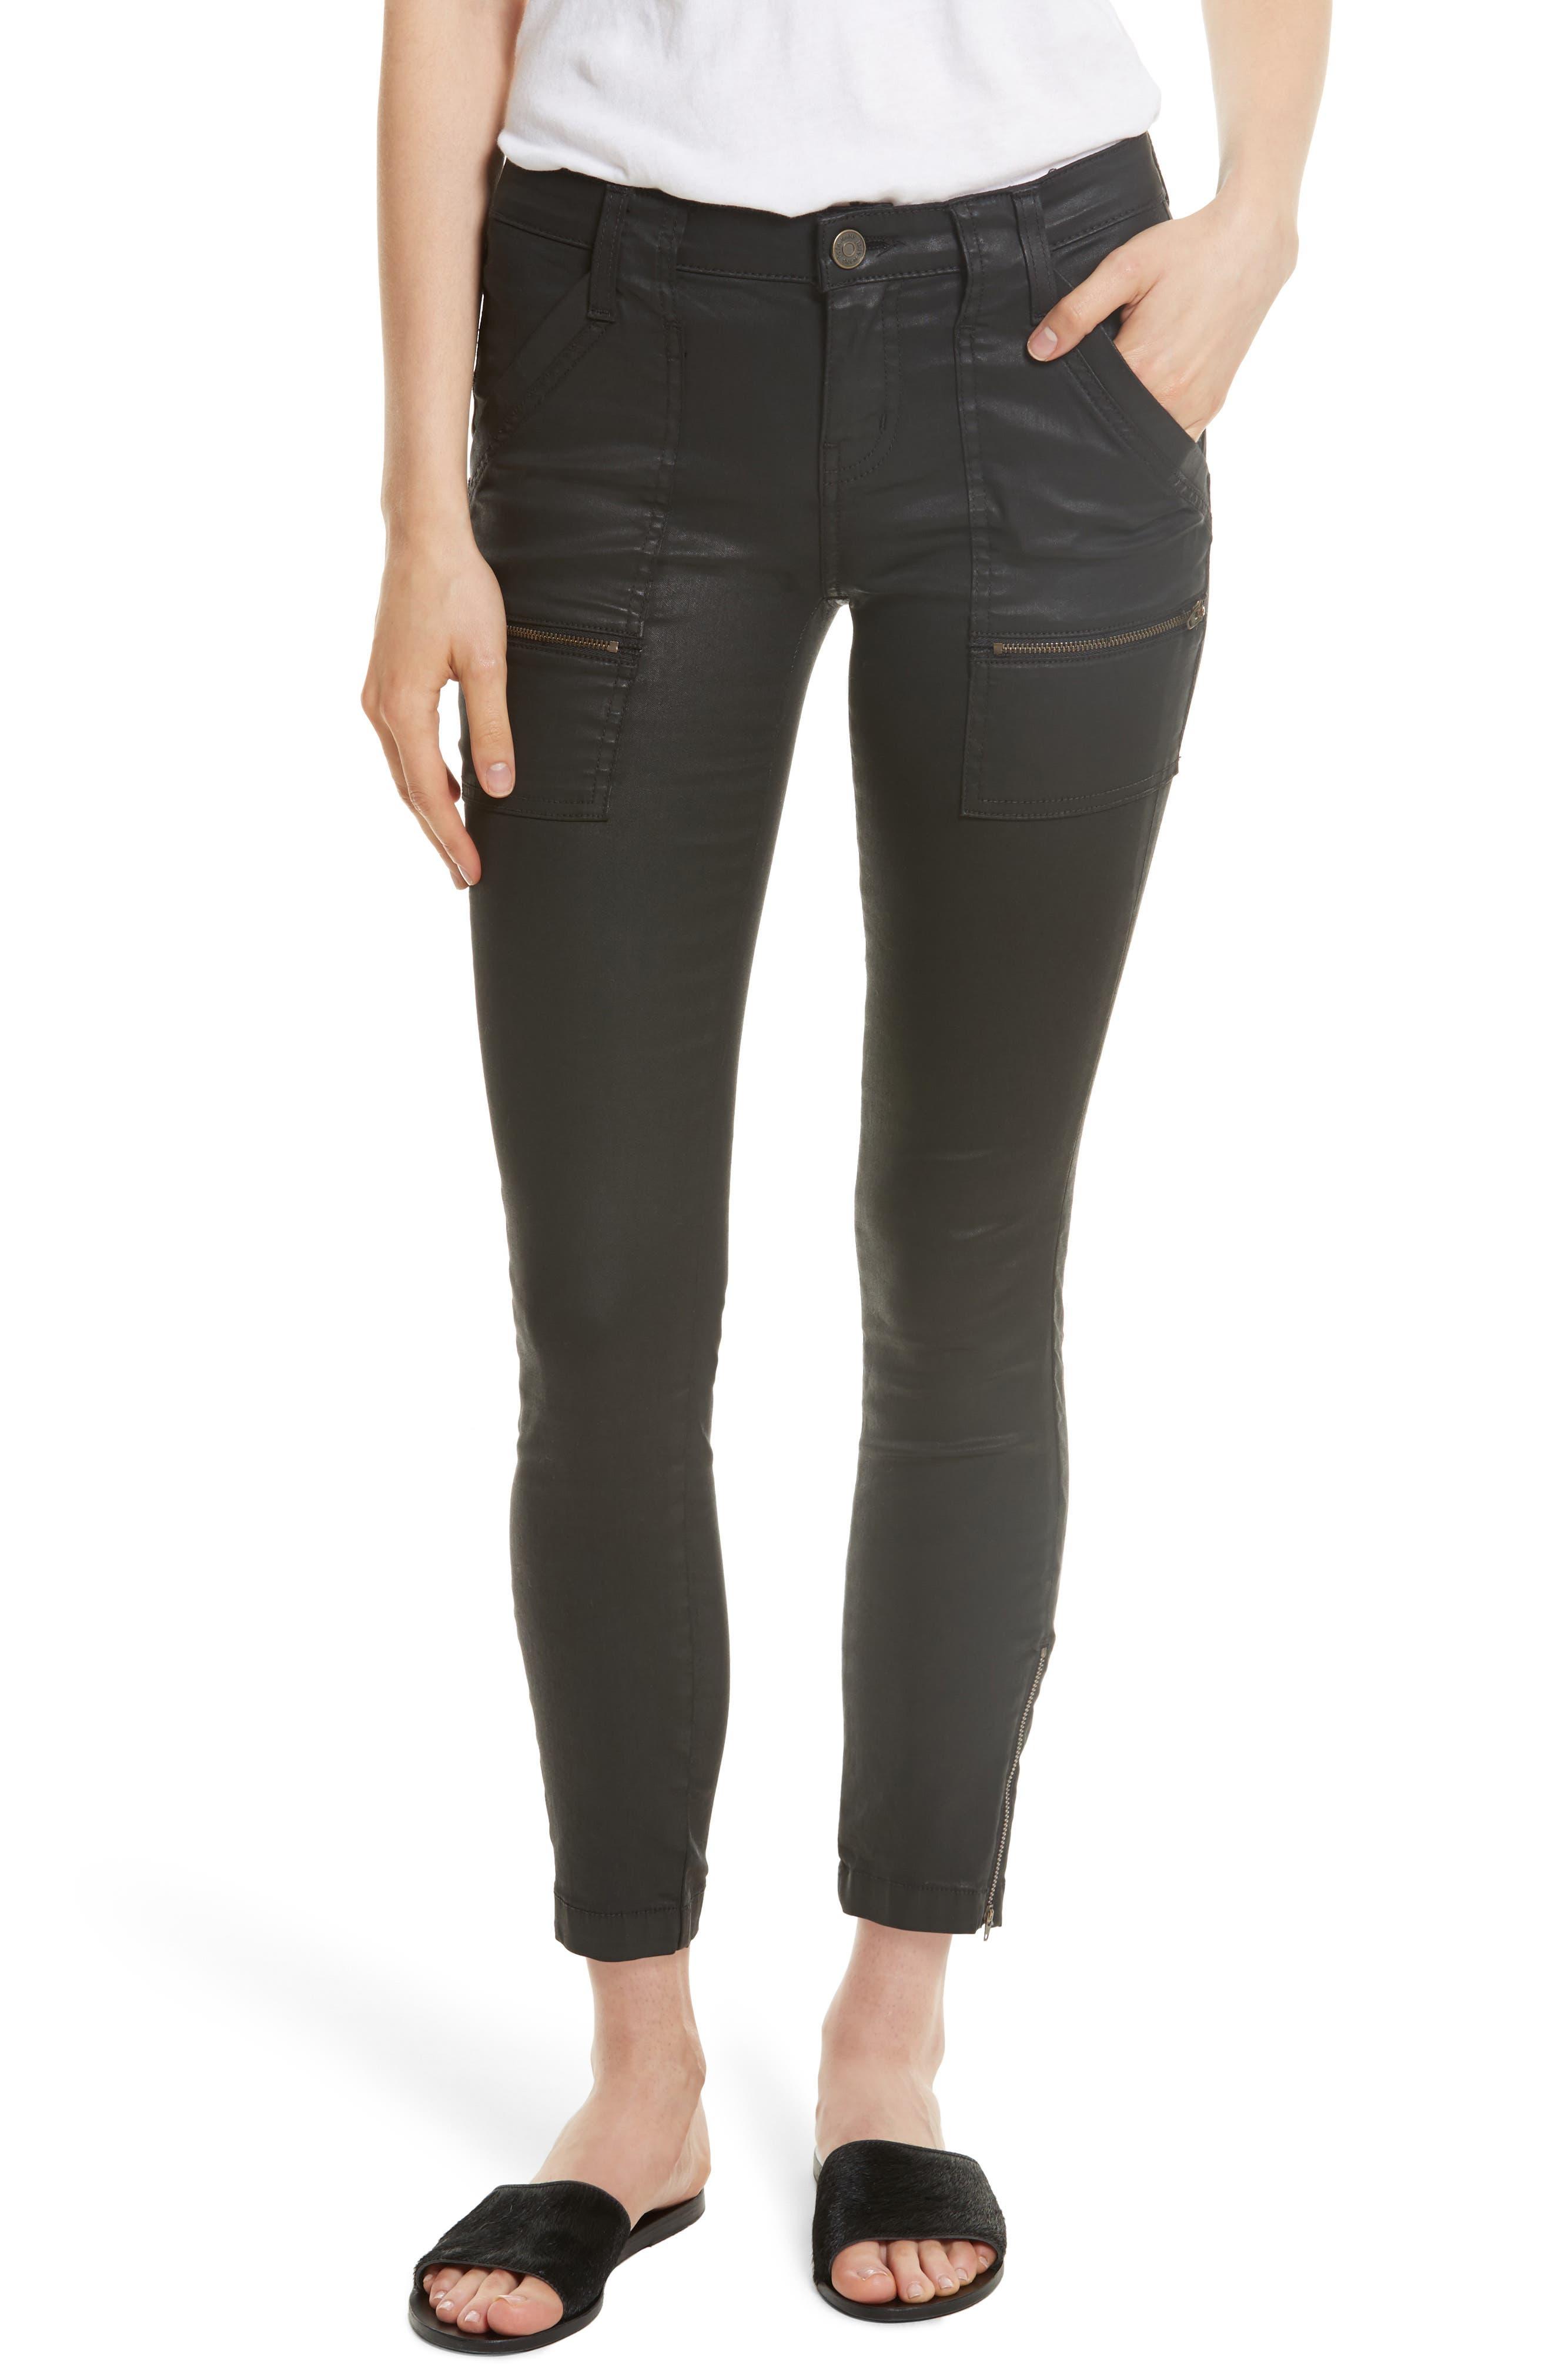 Alternate Image 1 Selected - Joie Park B Coated Skinny Jeans